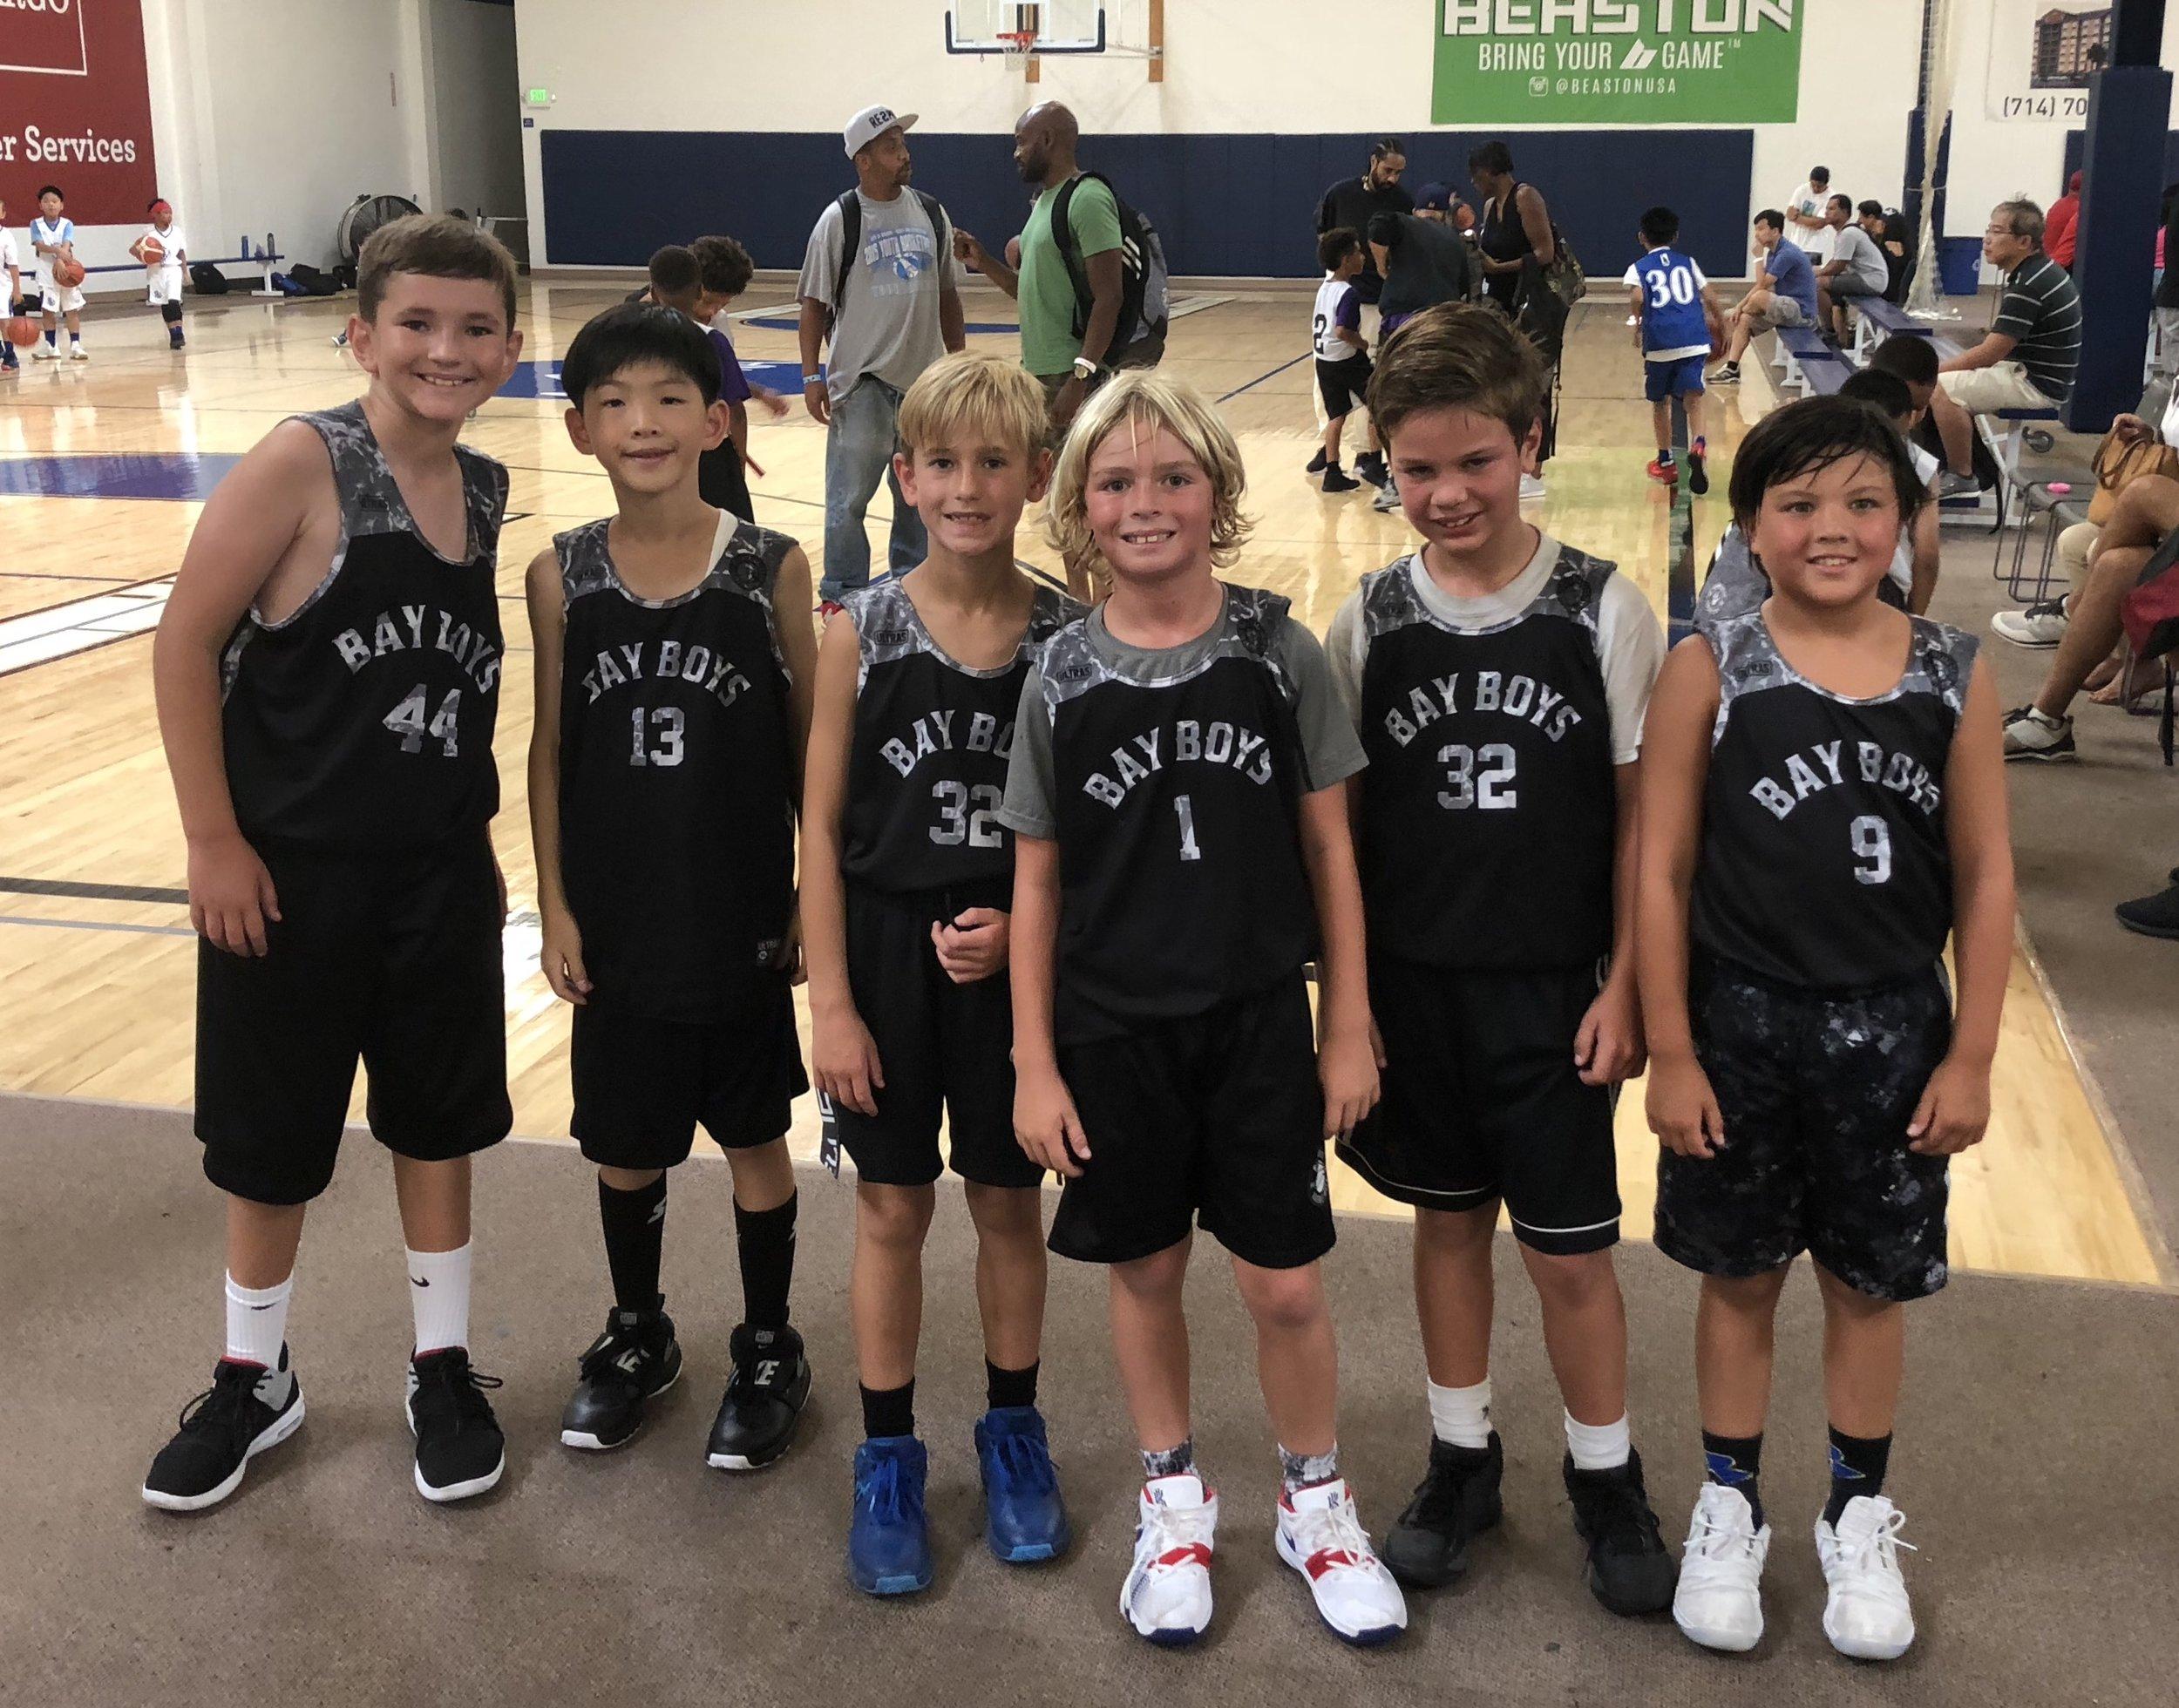 Bay Boys Select Teams